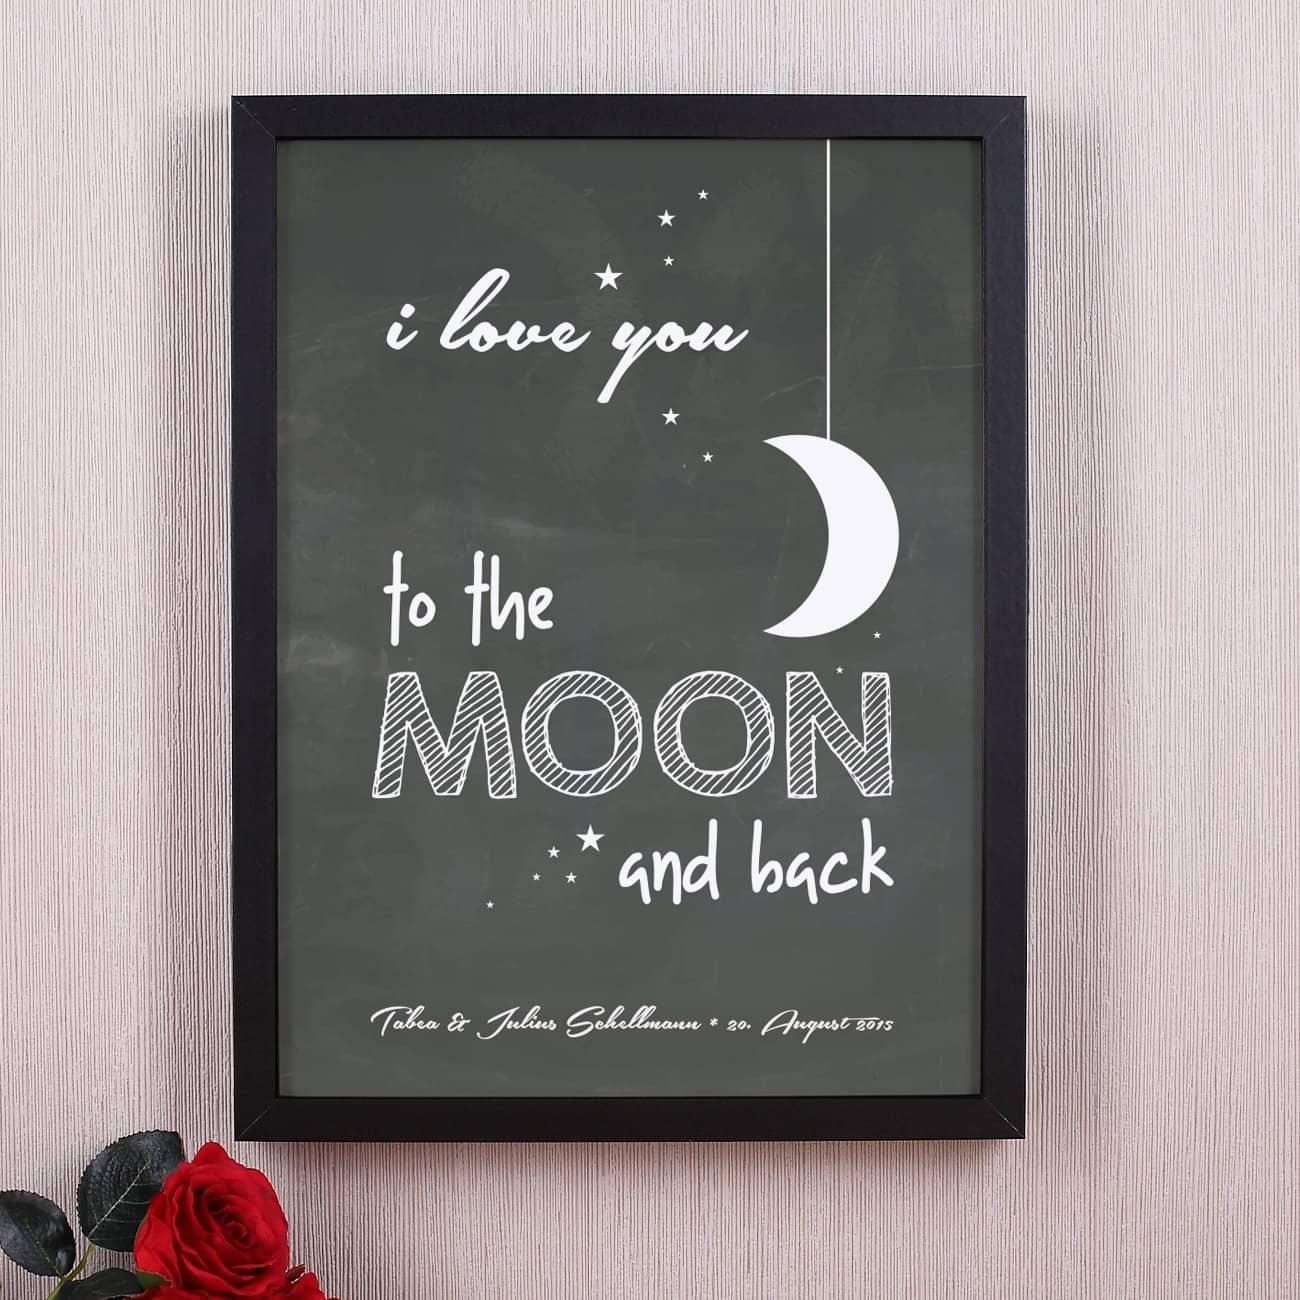 i love you to the moon and back gerahmtes poster mit ihrem wunschtext geschenke. Black Bedroom Furniture Sets. Home Design Ideas